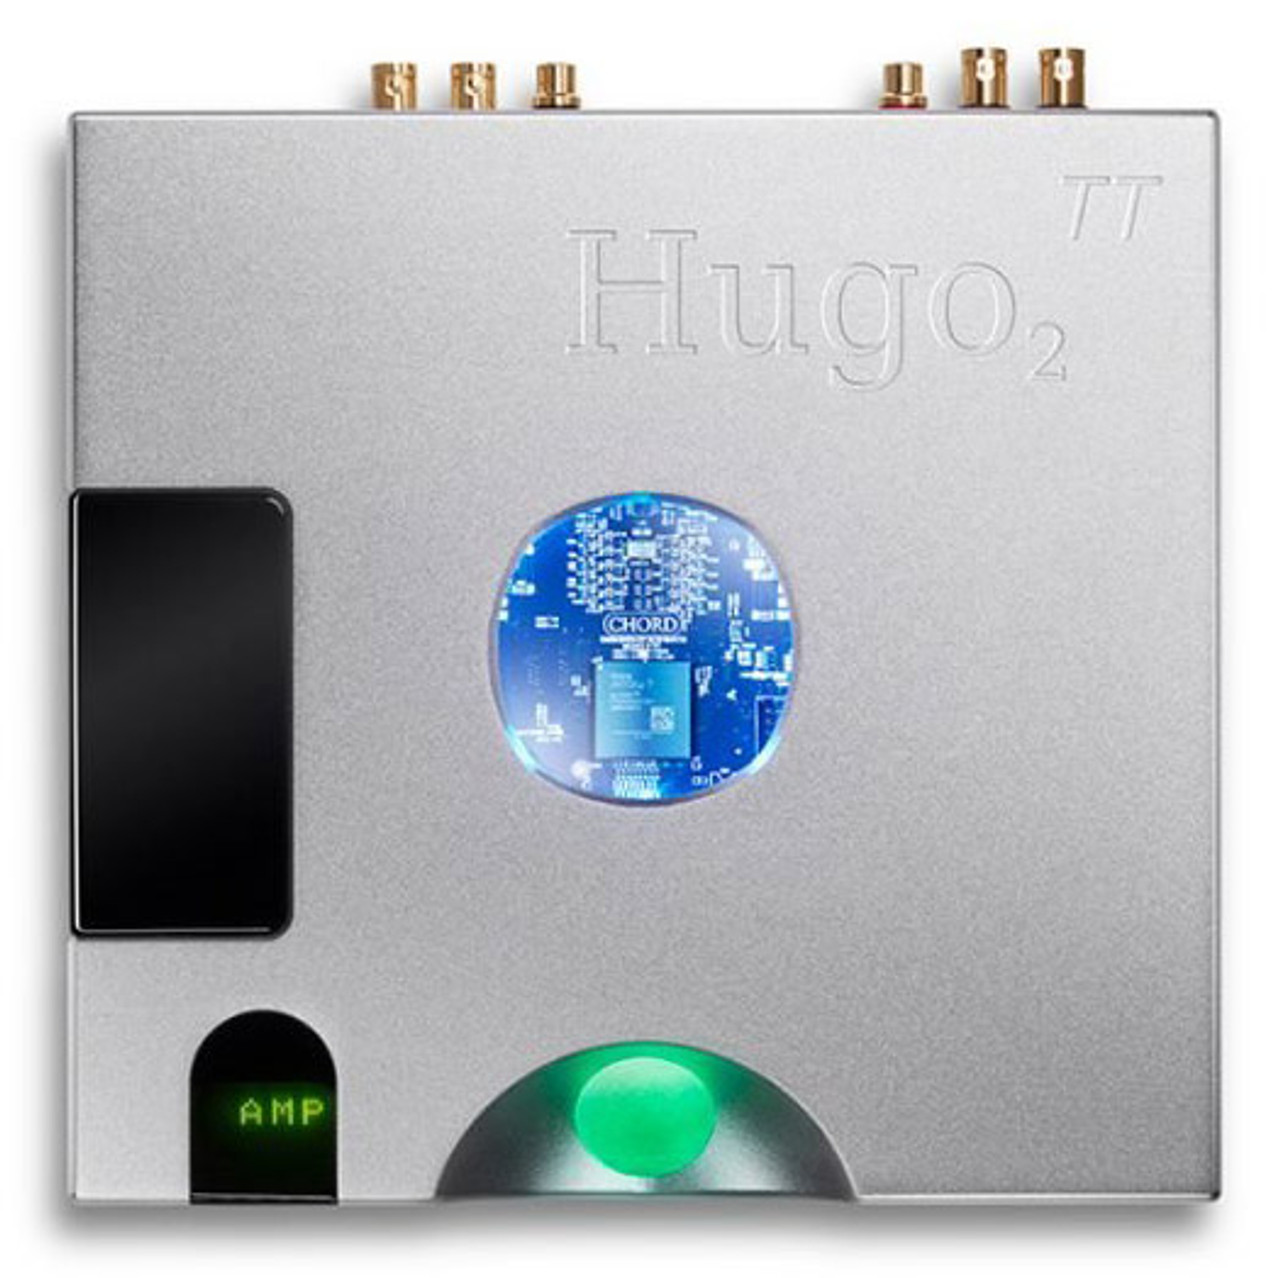 Chord Hugo TT 2 DAC preamp headphone amp